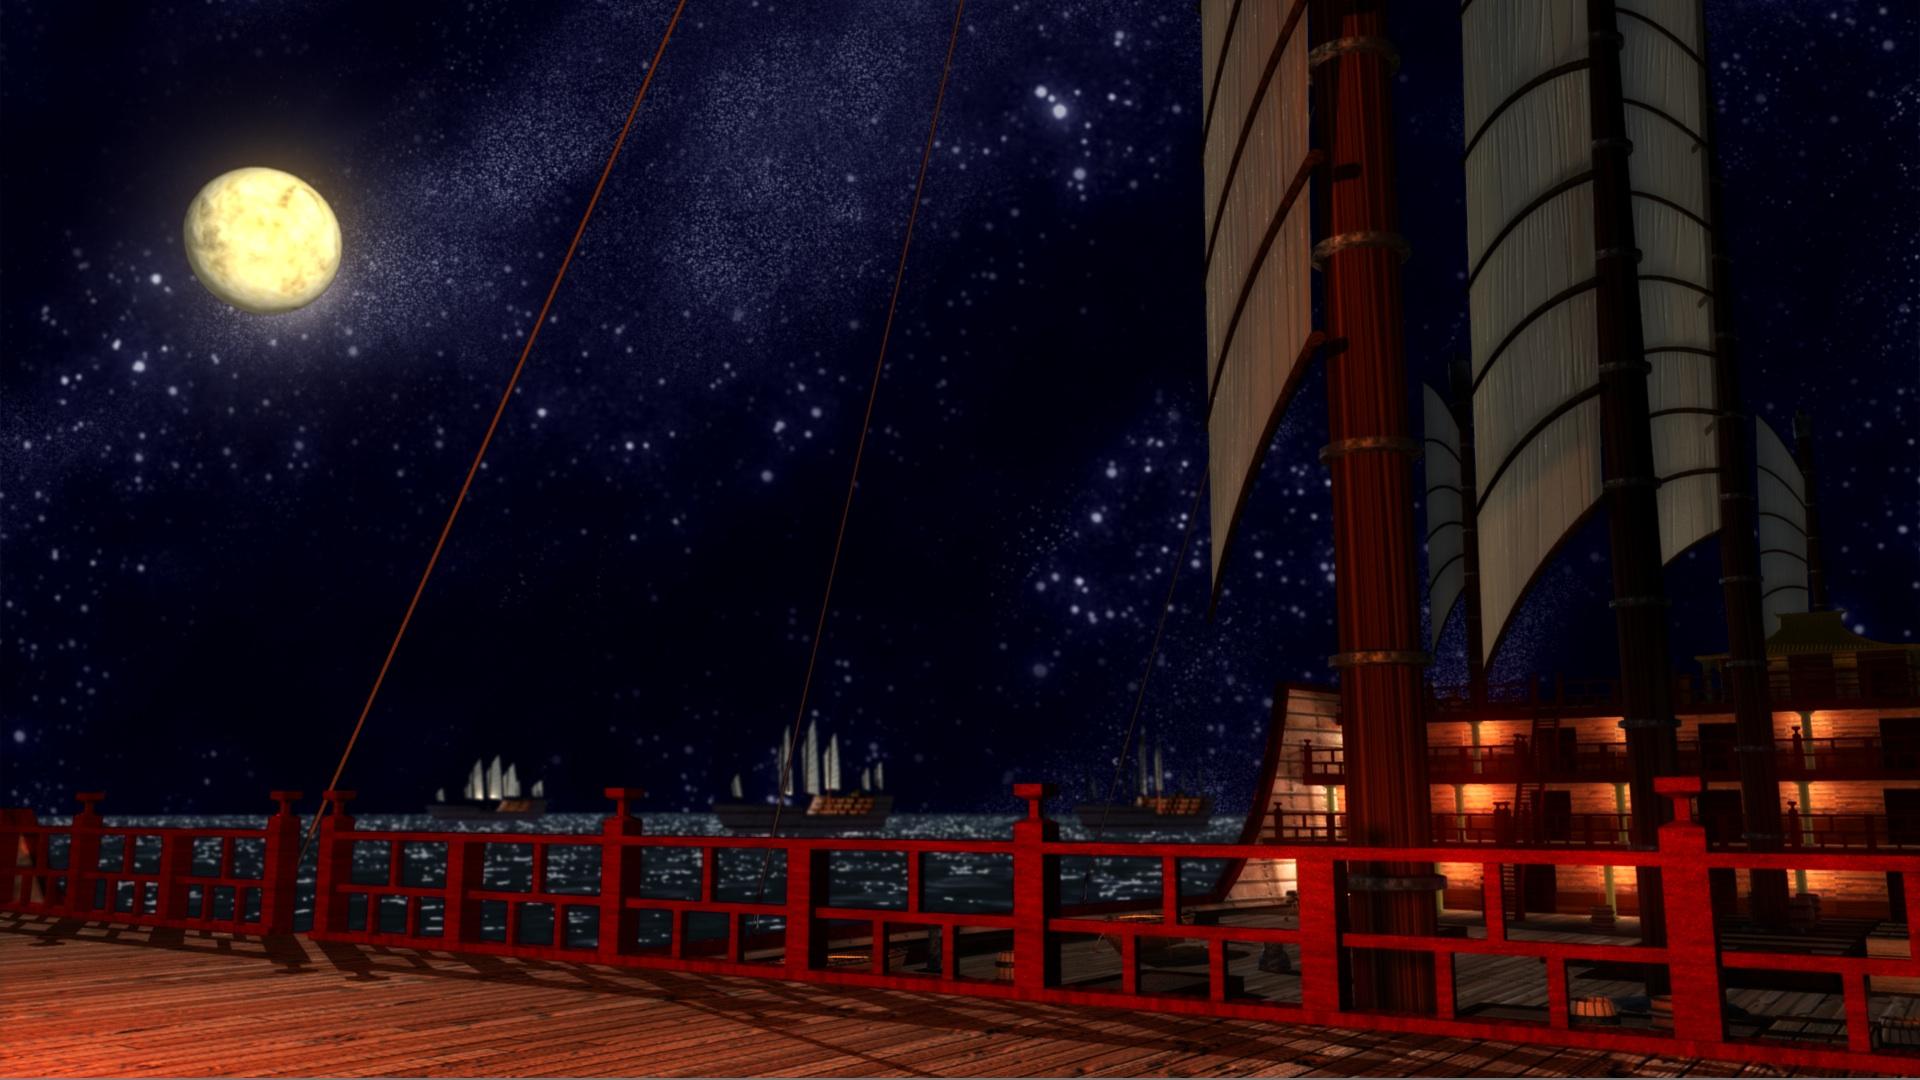 Khan's ship